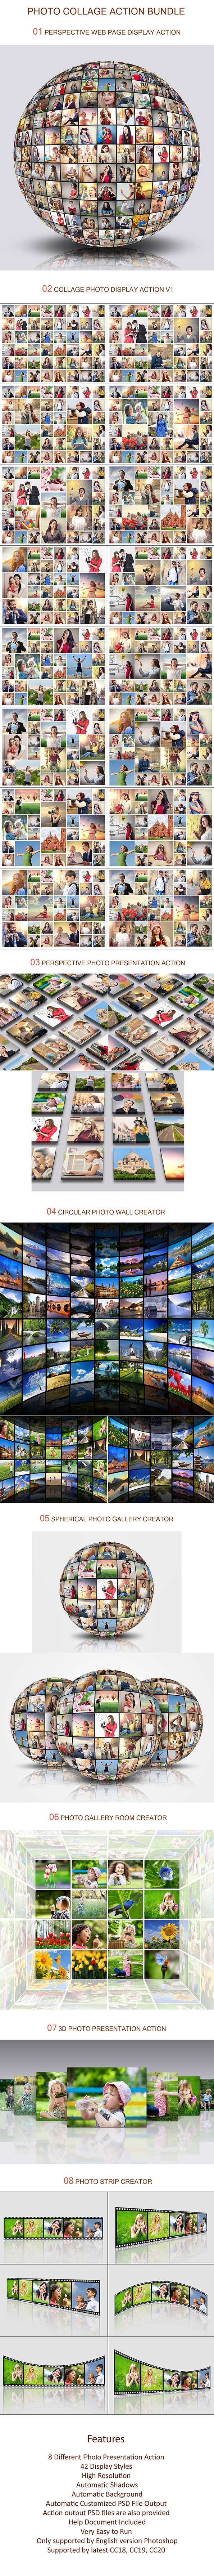 Photo Collage Action Bundle - 1